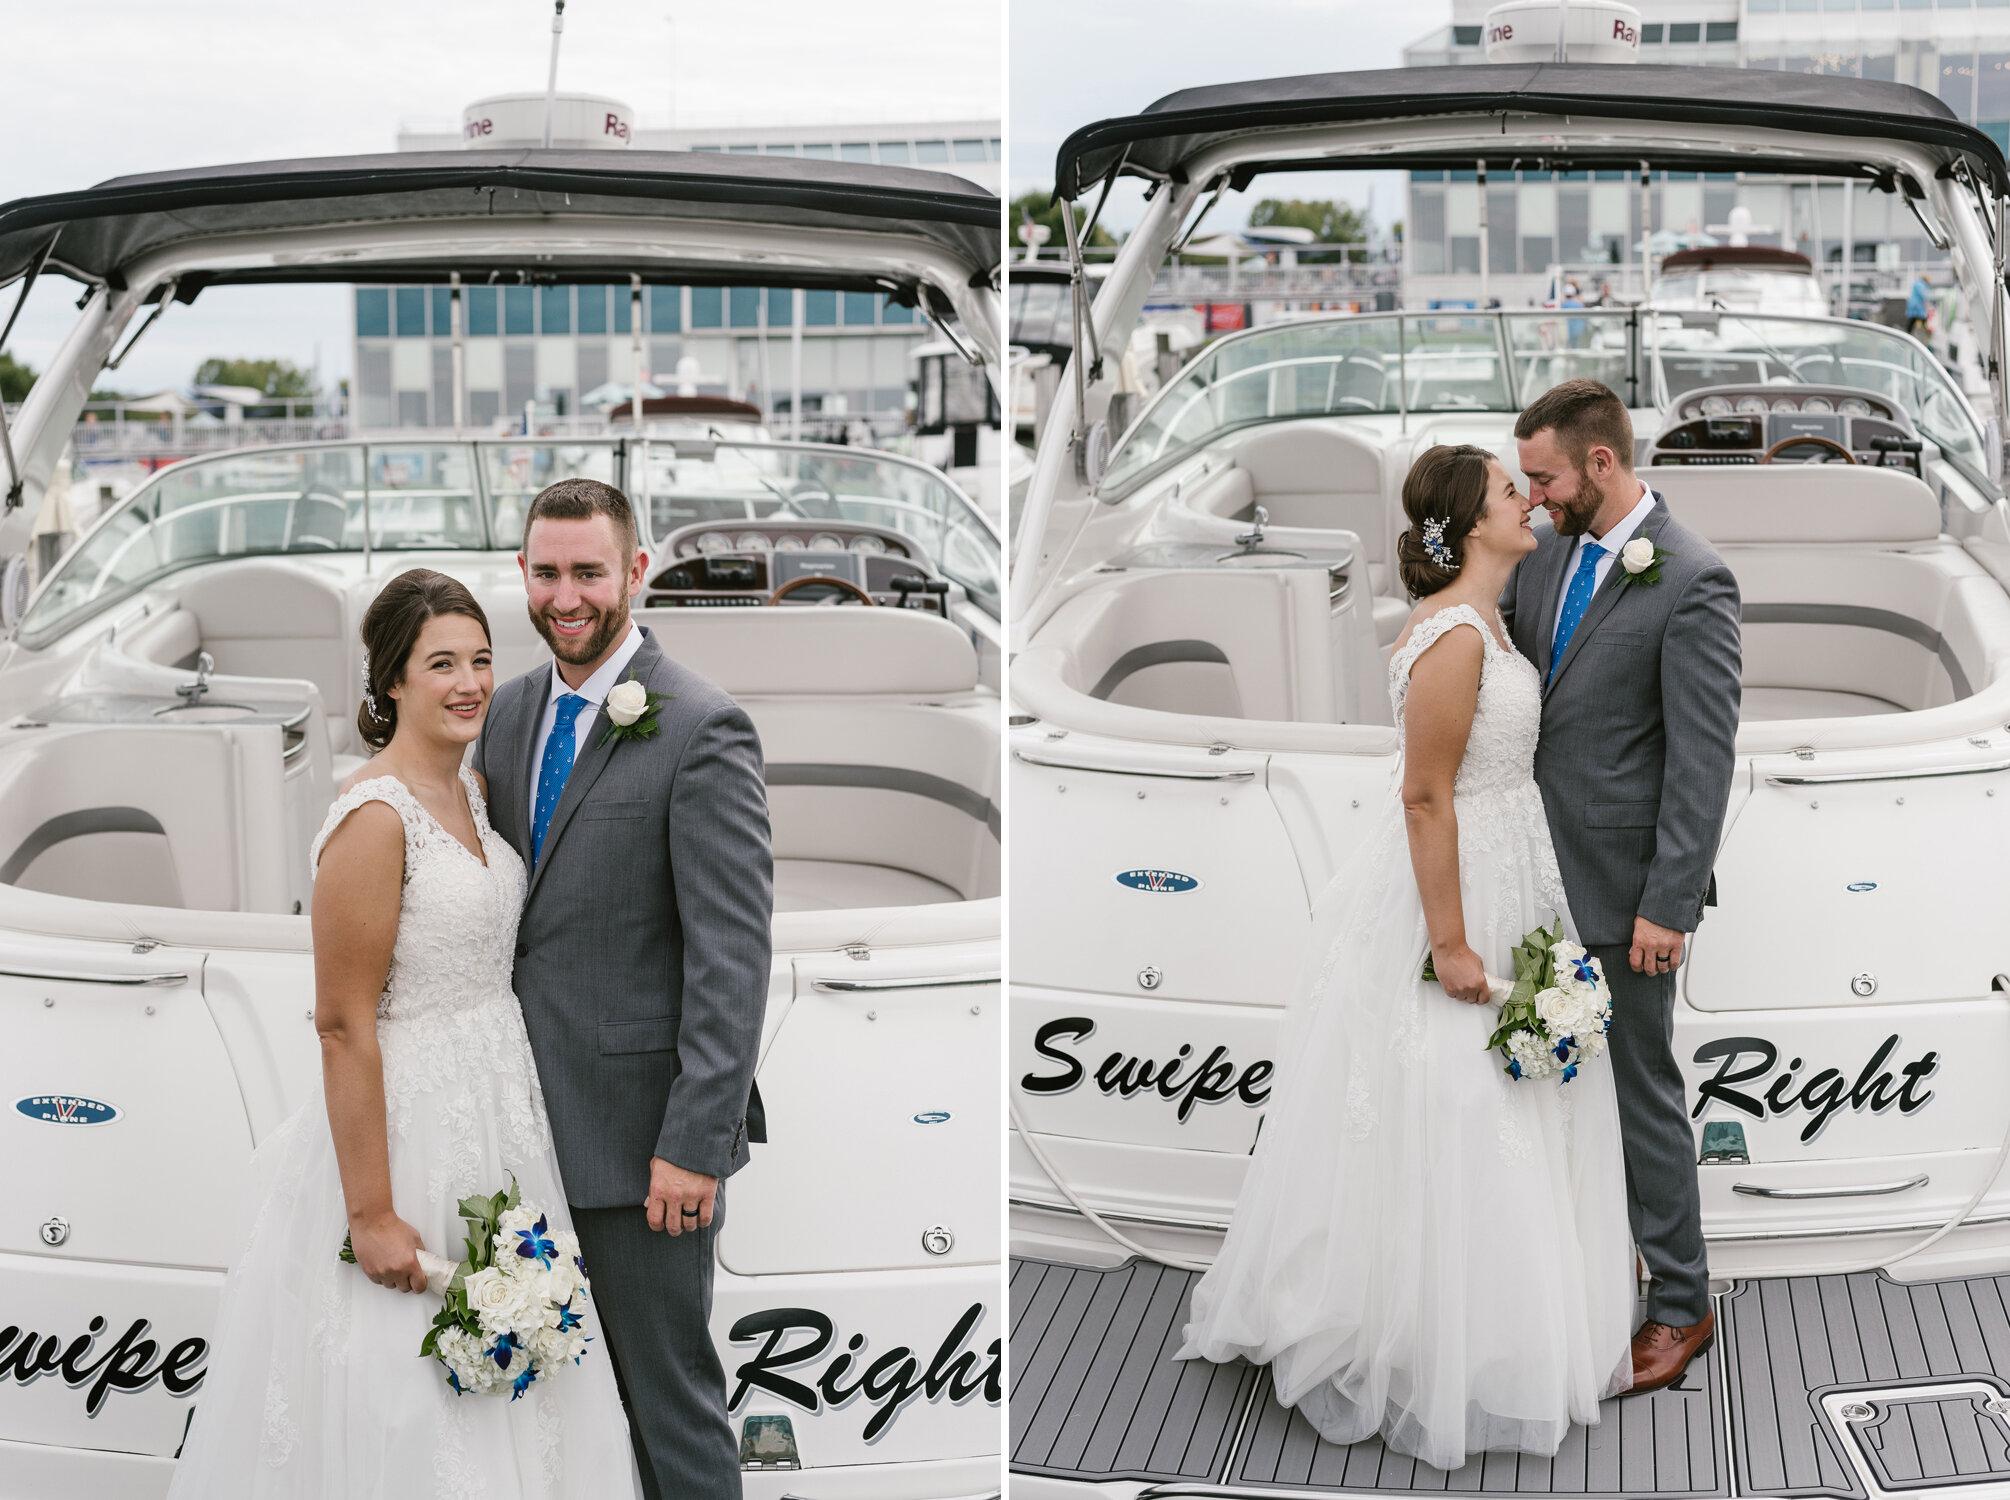 st-clair-shores-wedding-macray-harbor (66).jpg